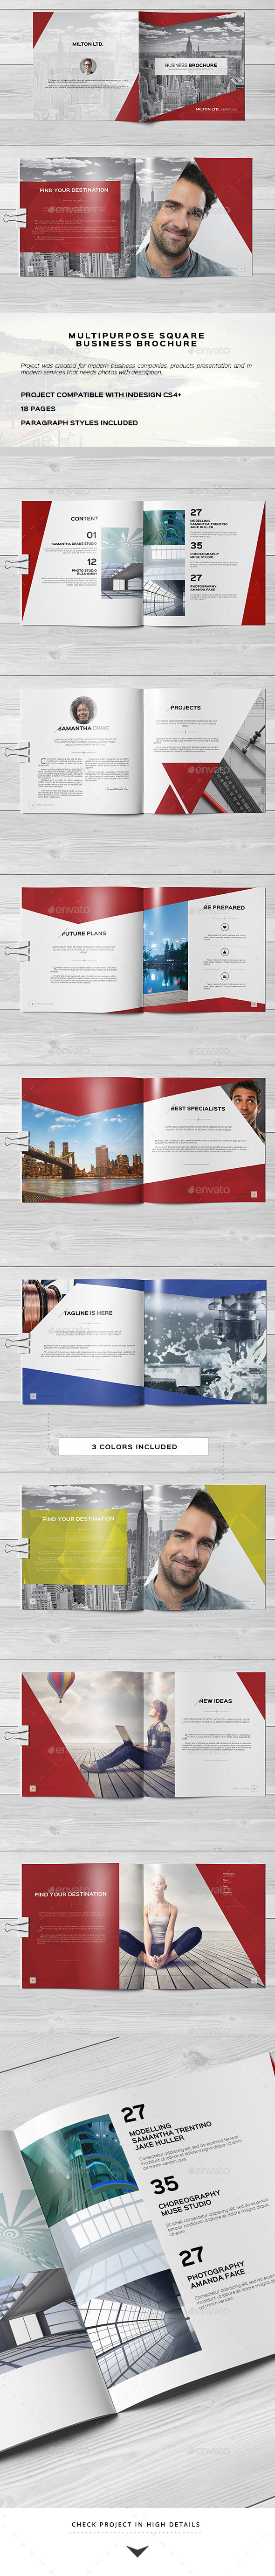 Multipurpose Square Business Catalog / Brochure - Catalogs Brochures